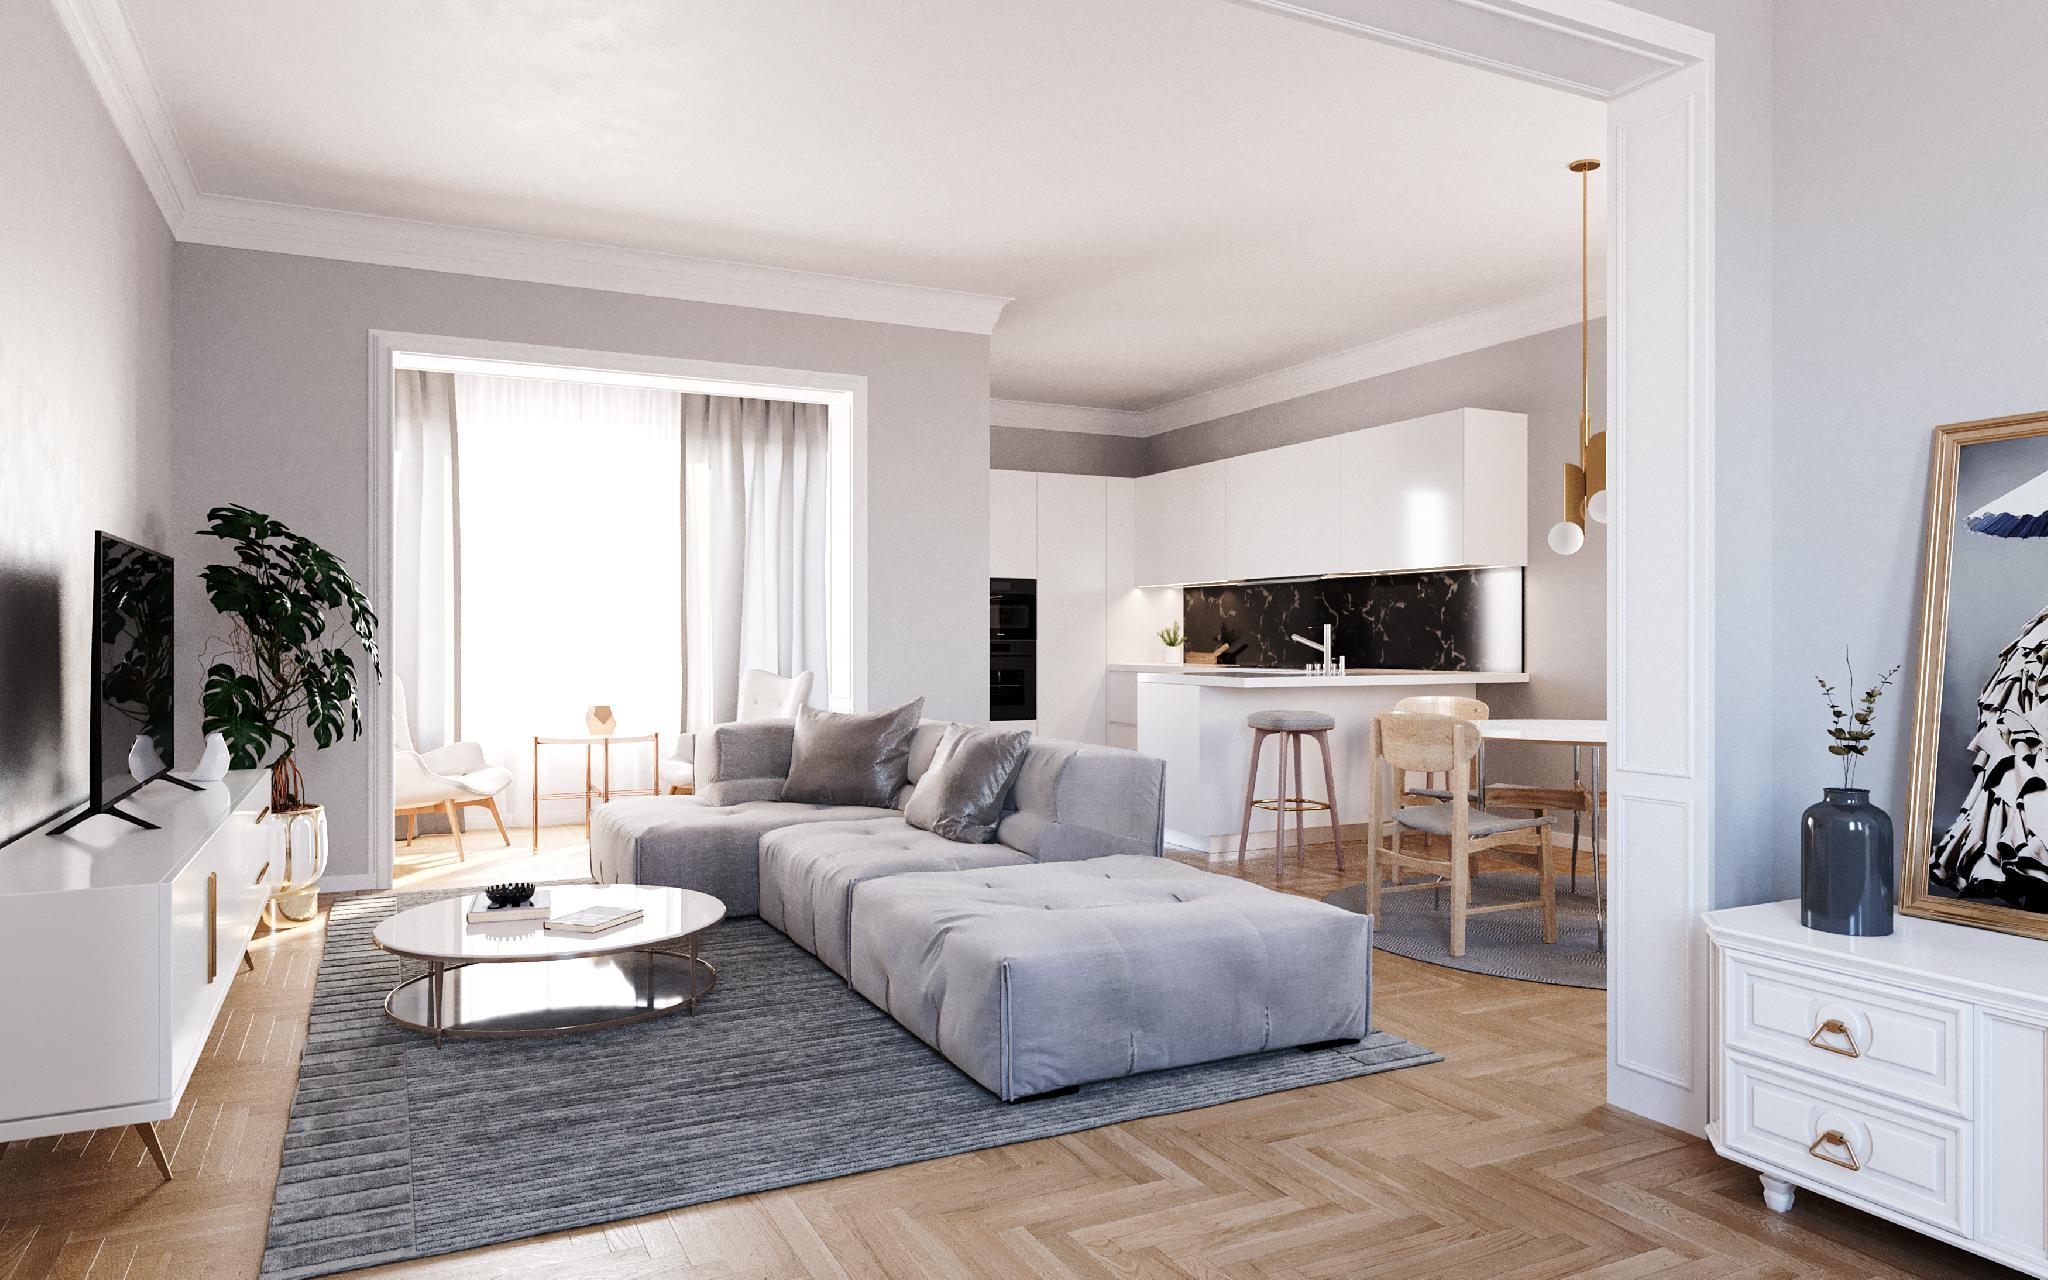 166582 Flat for sale in Eixample, Dreta Eixample 1